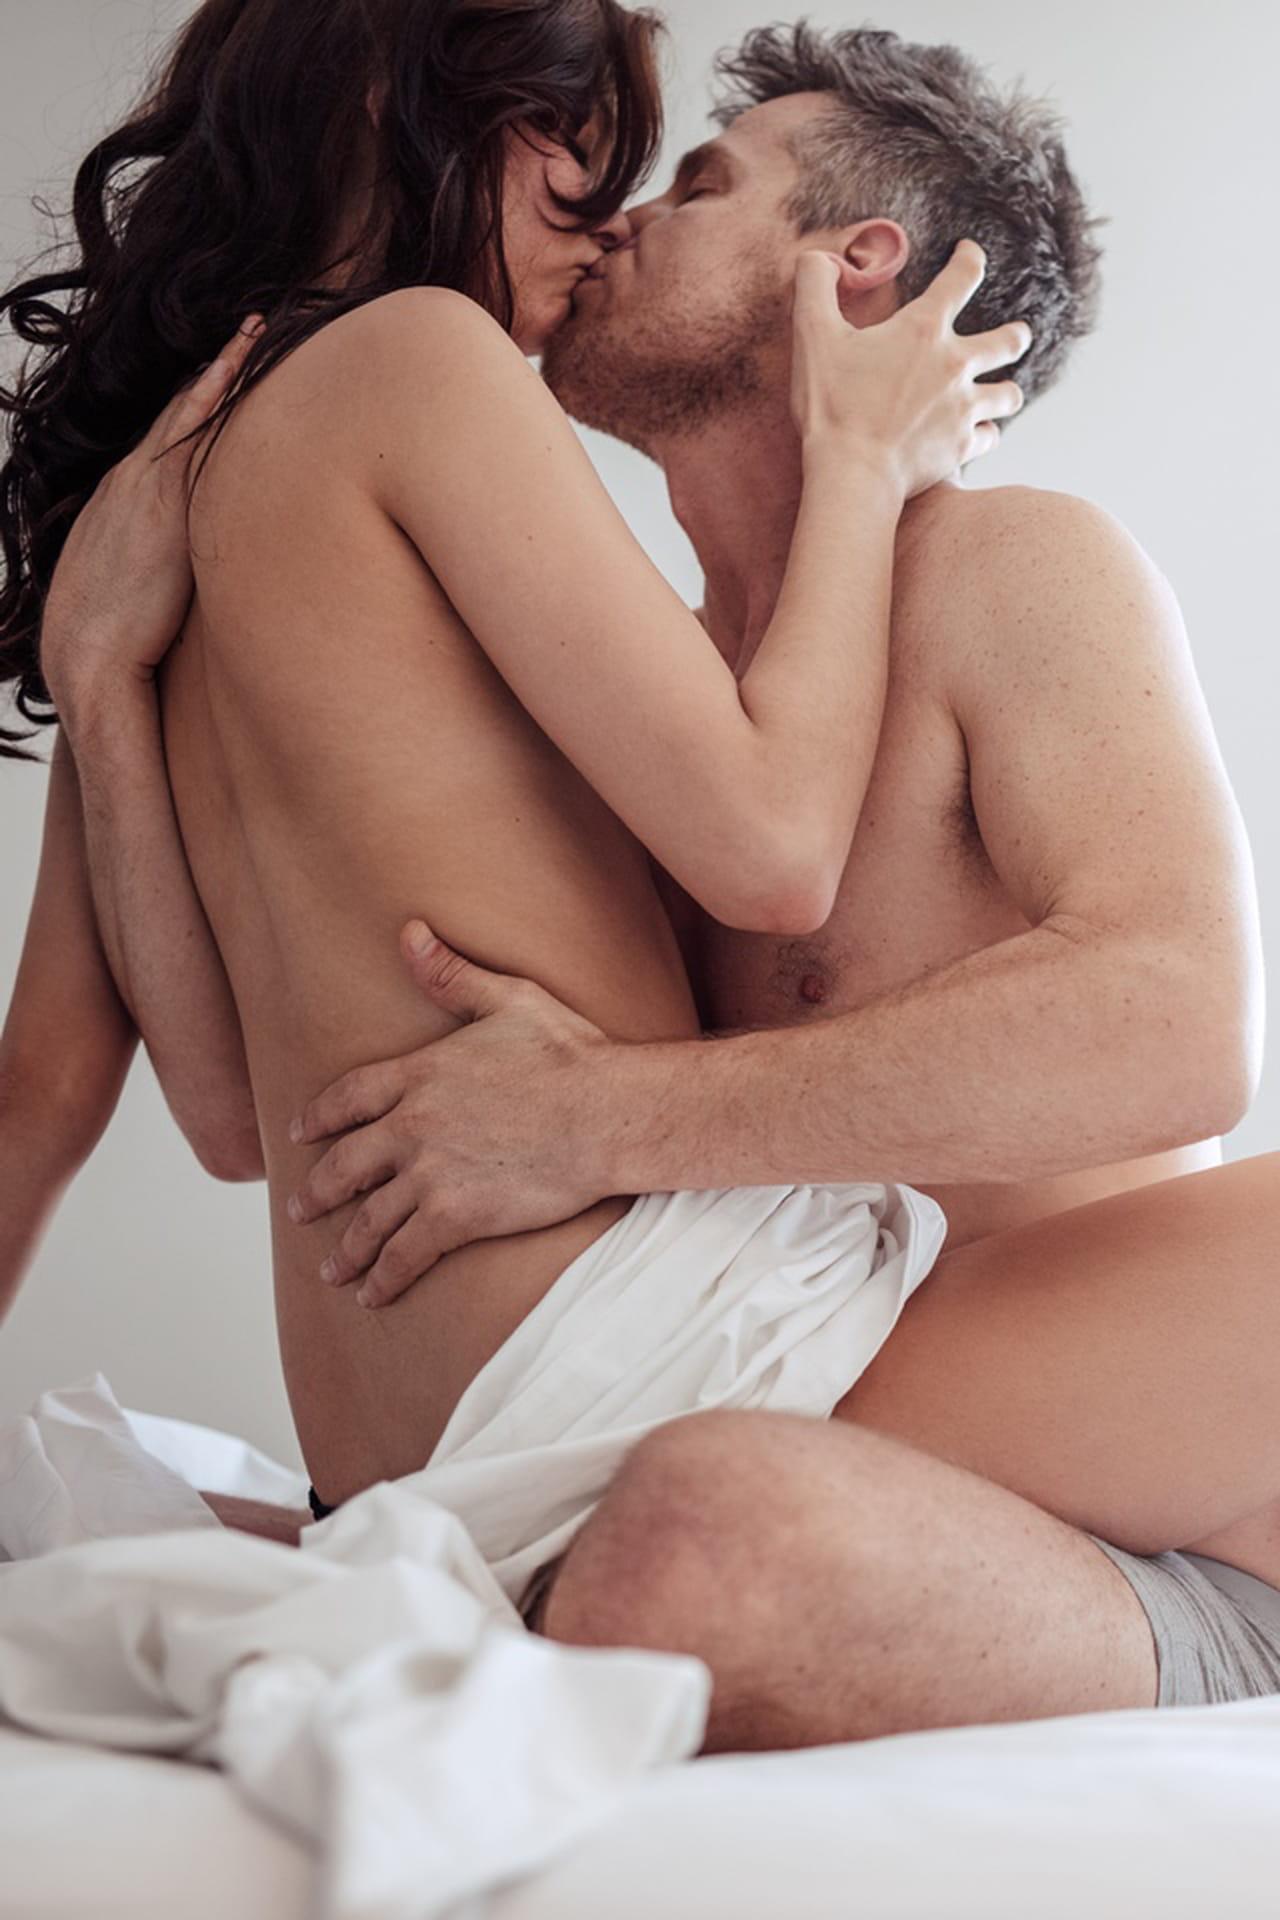 Dois desejos sex